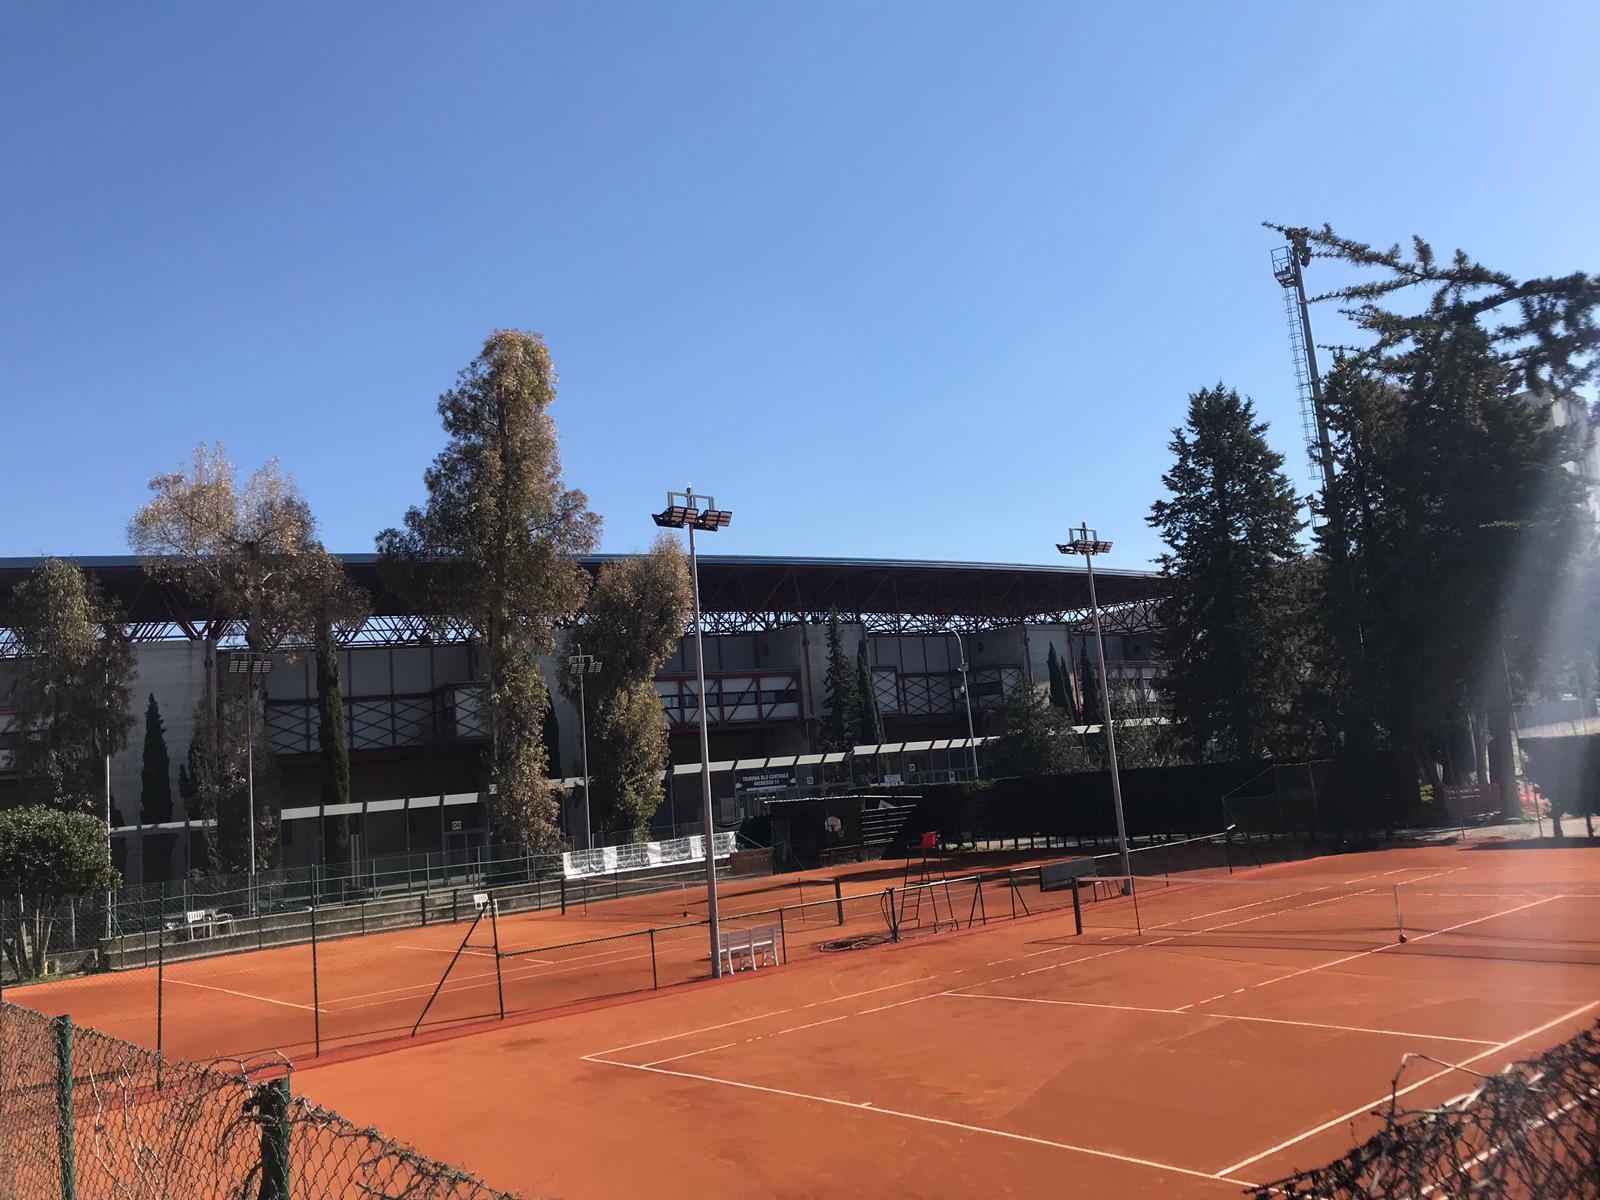 campi tennis terra rossa